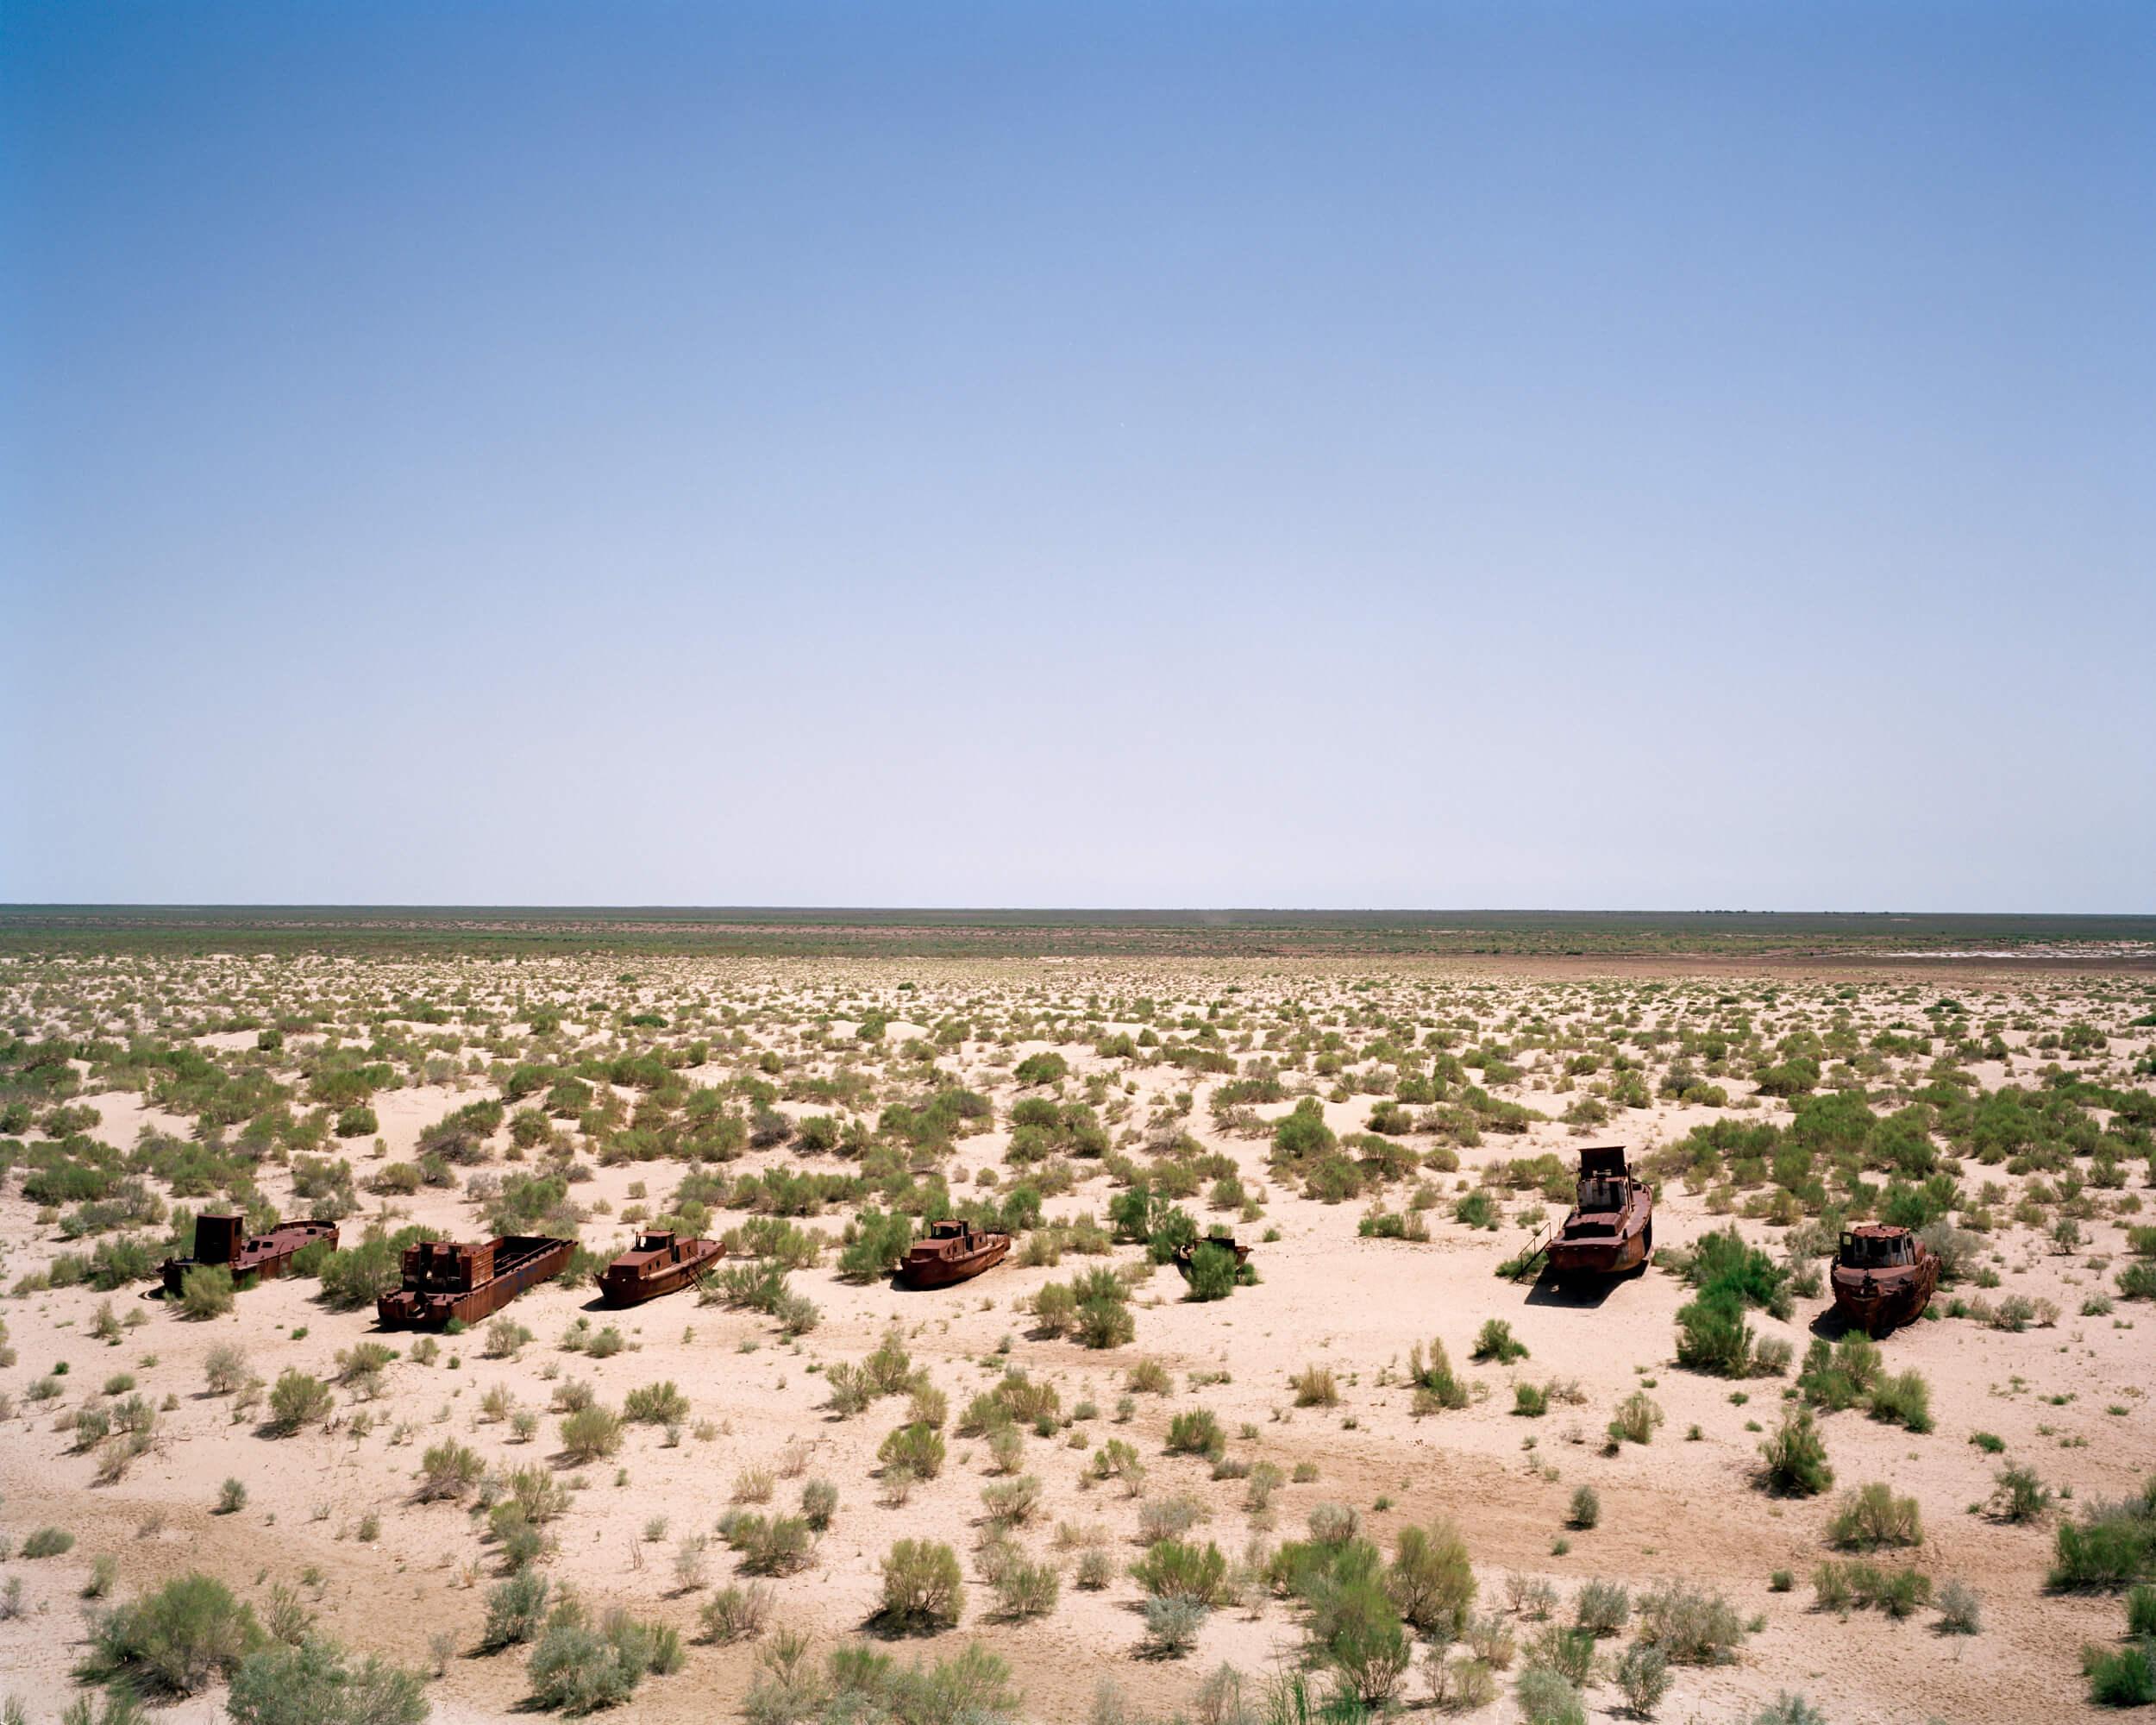 marco-barbieri-water-in-the-desert-50.jpg